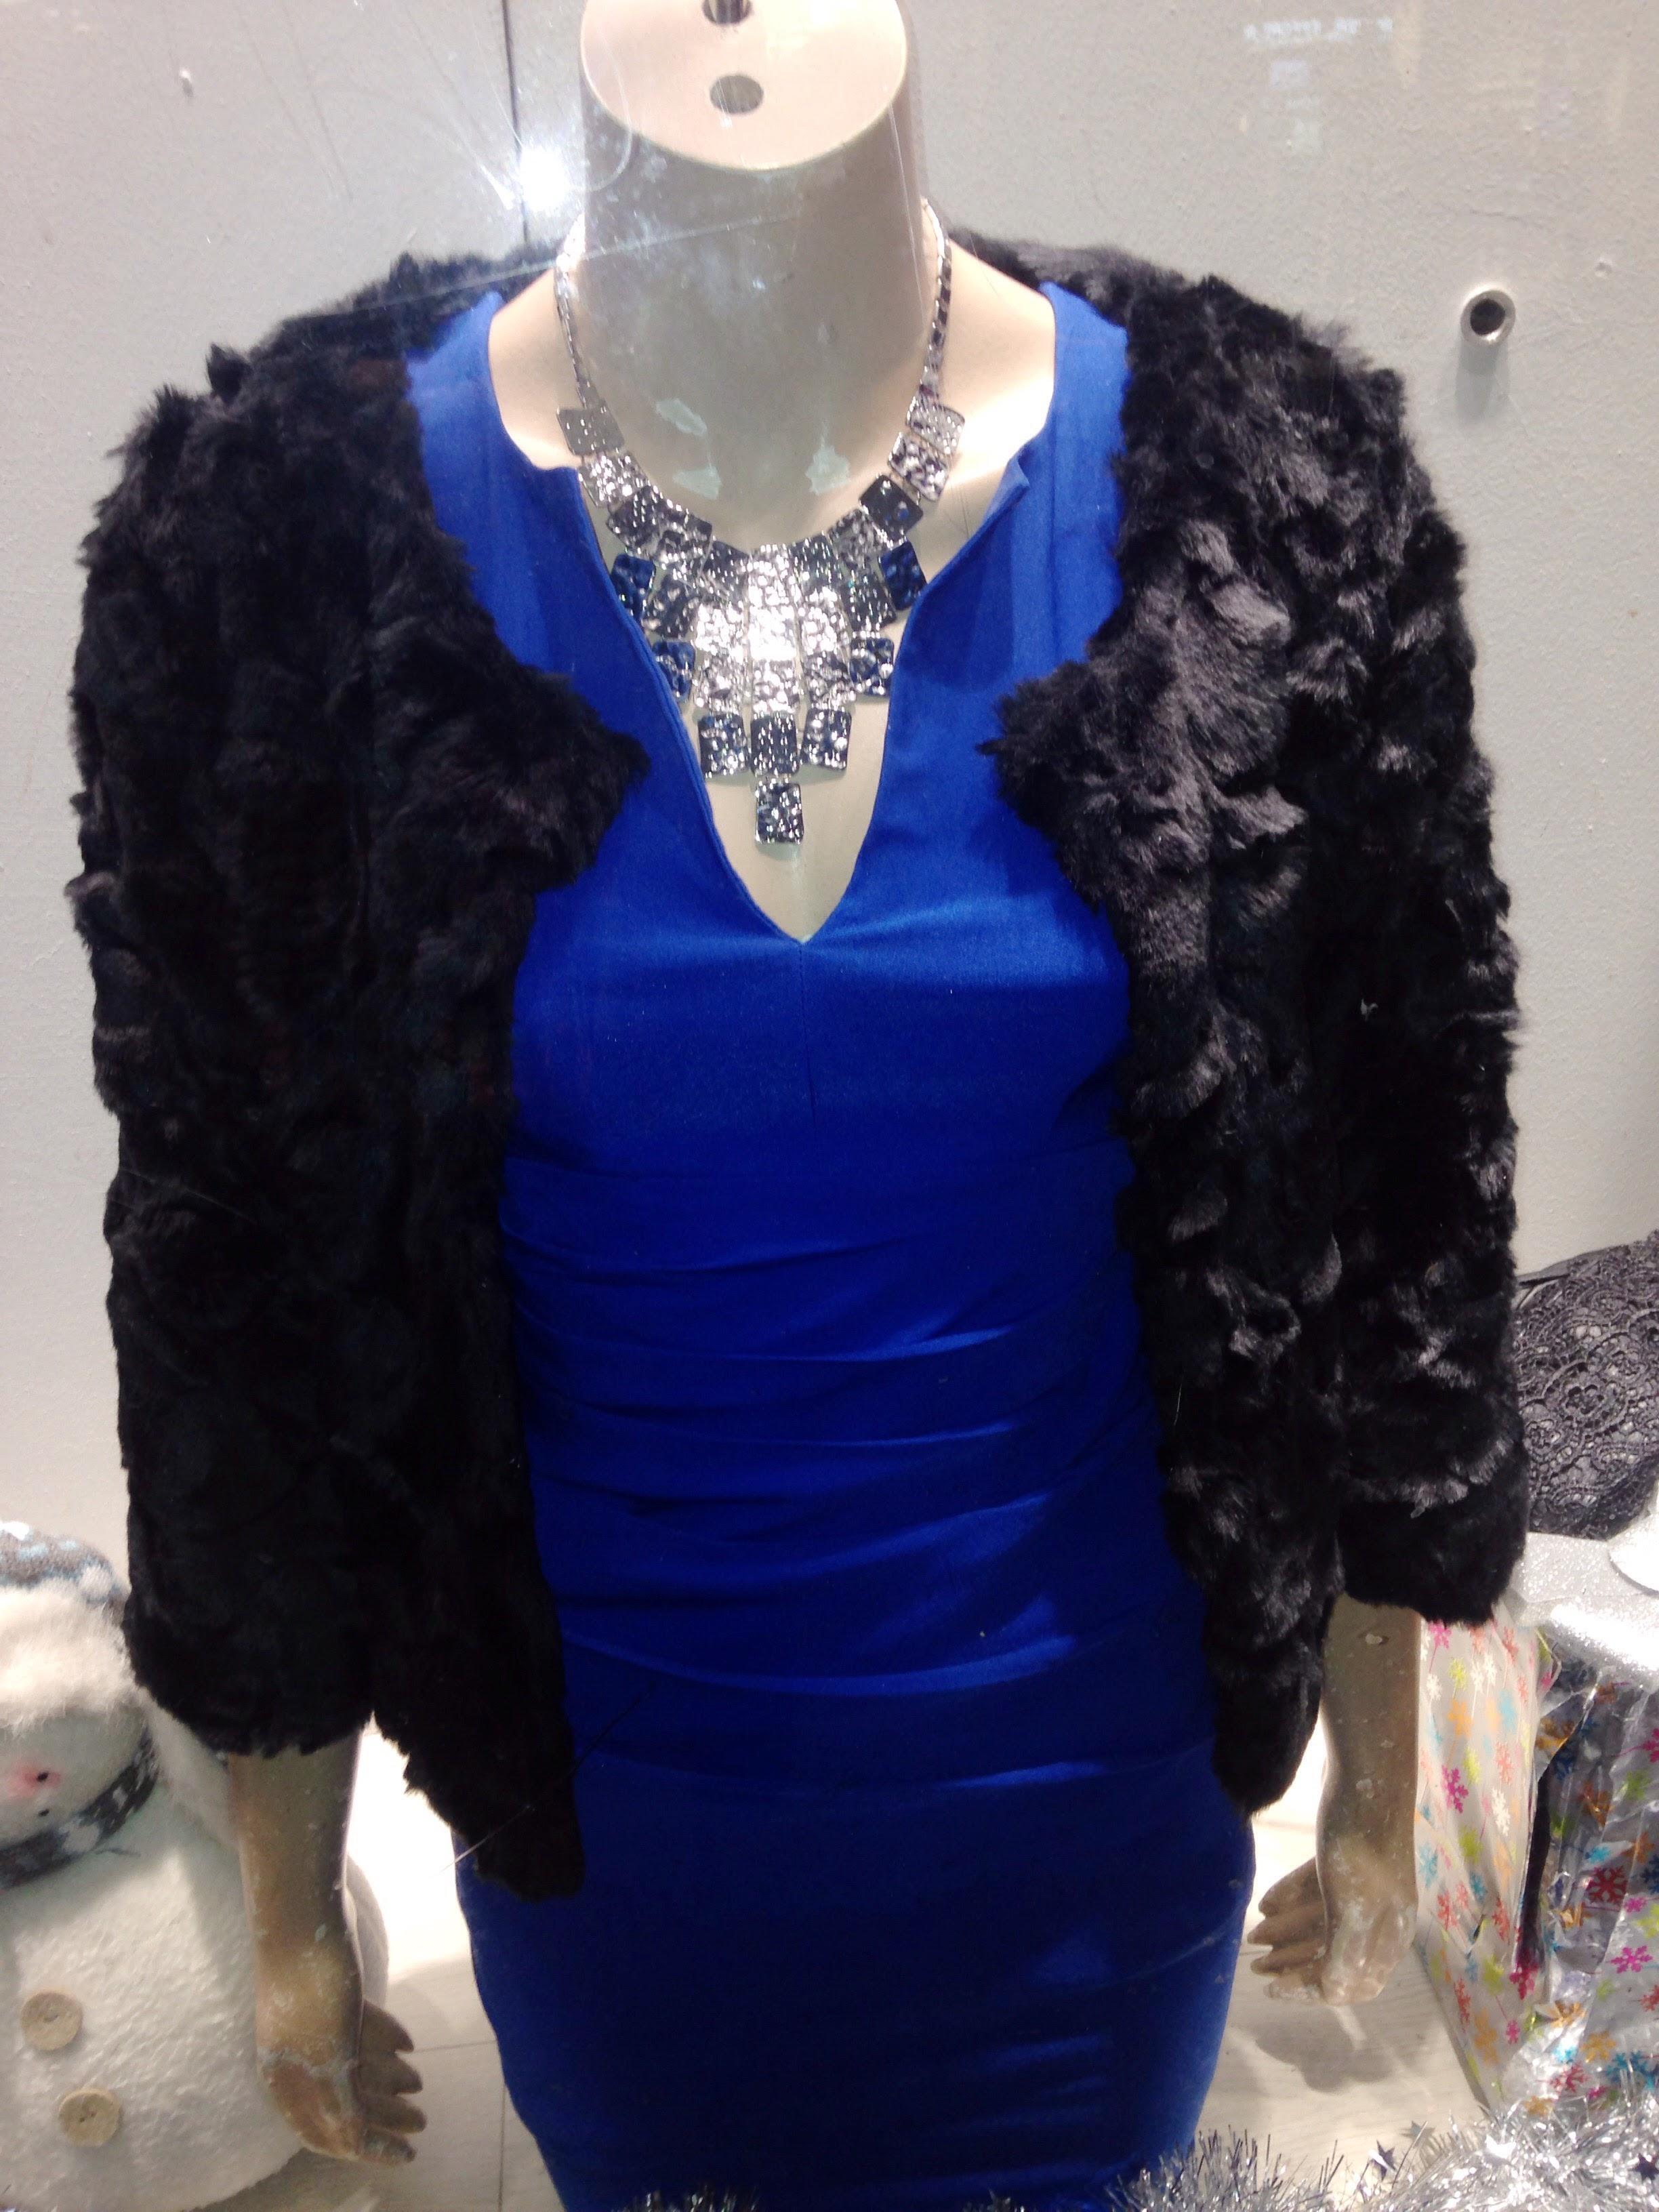 Swamp Dublin! Blue body con worn underneath a fur crop Jacket! Dress €49.99 Jacket €30.00